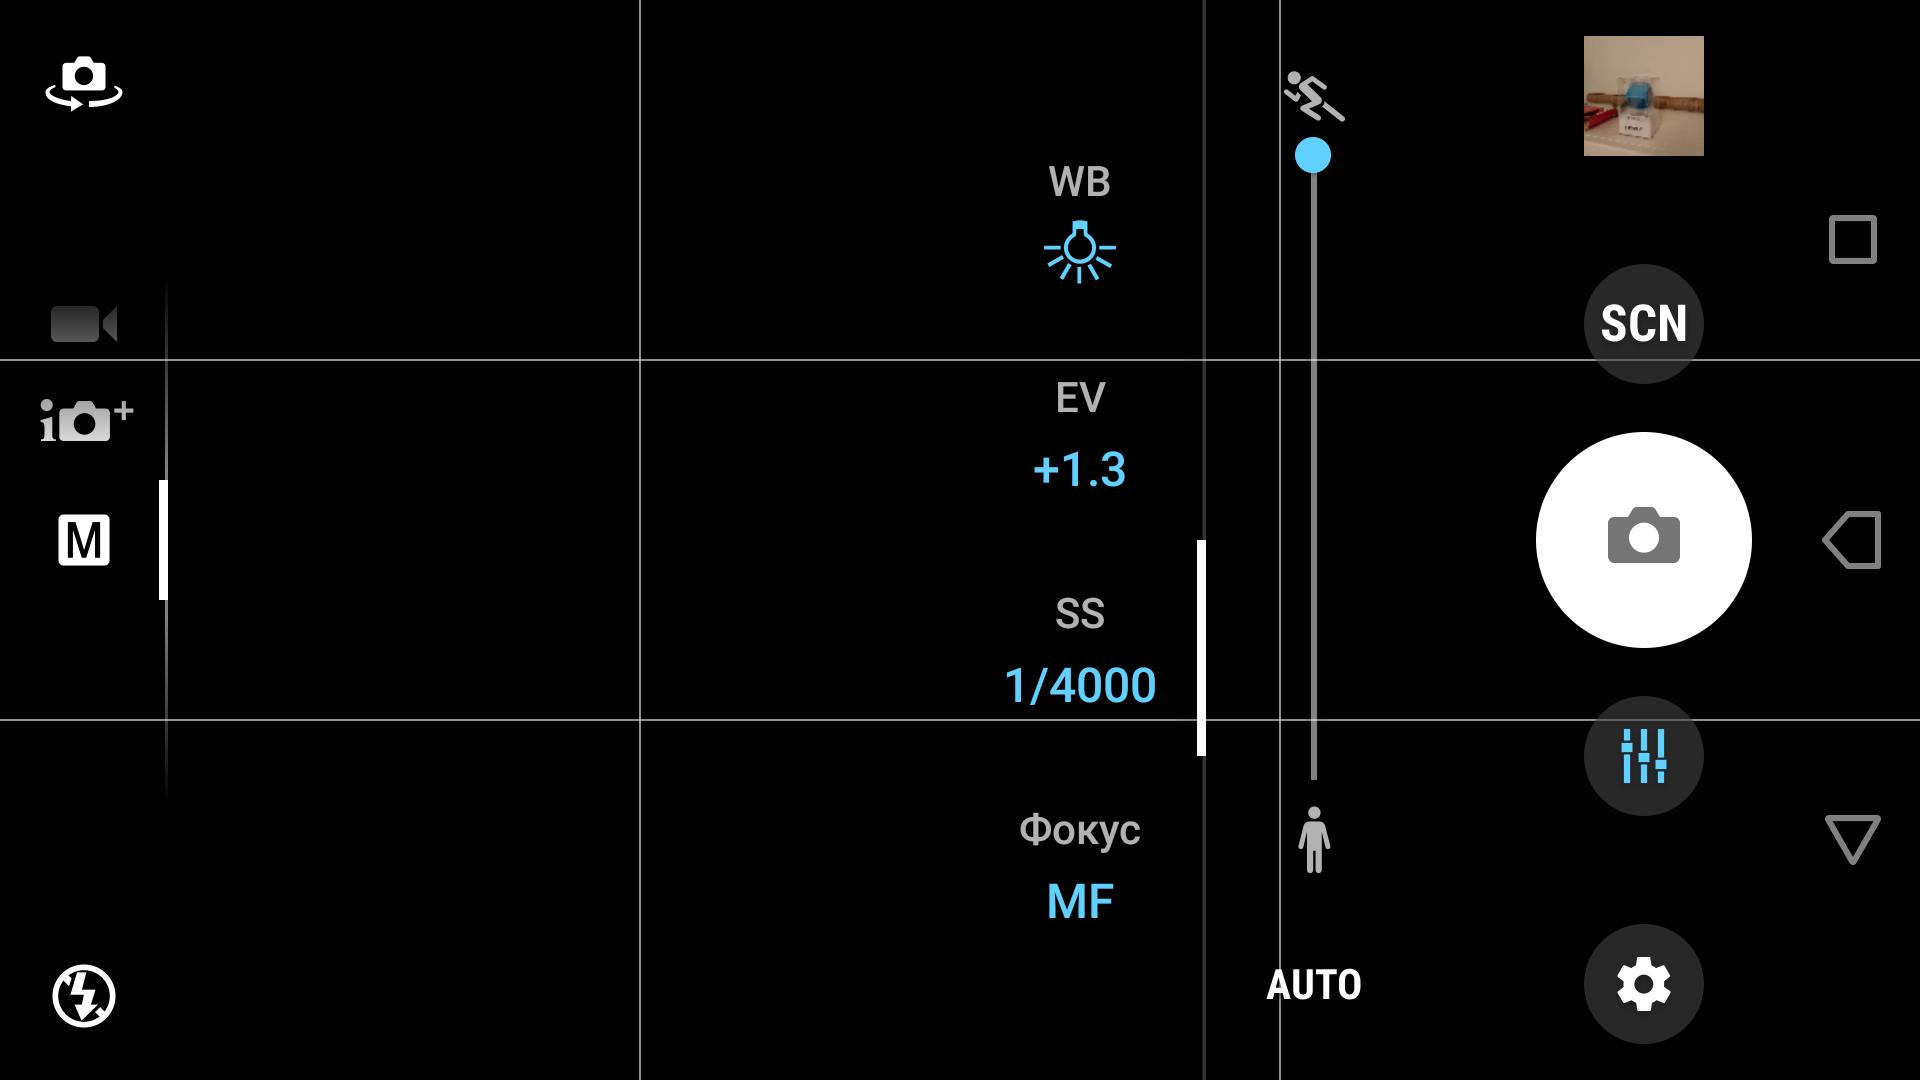 Обзор Android 7.0 Nougat для Sony Xperia X - выдержка камеры